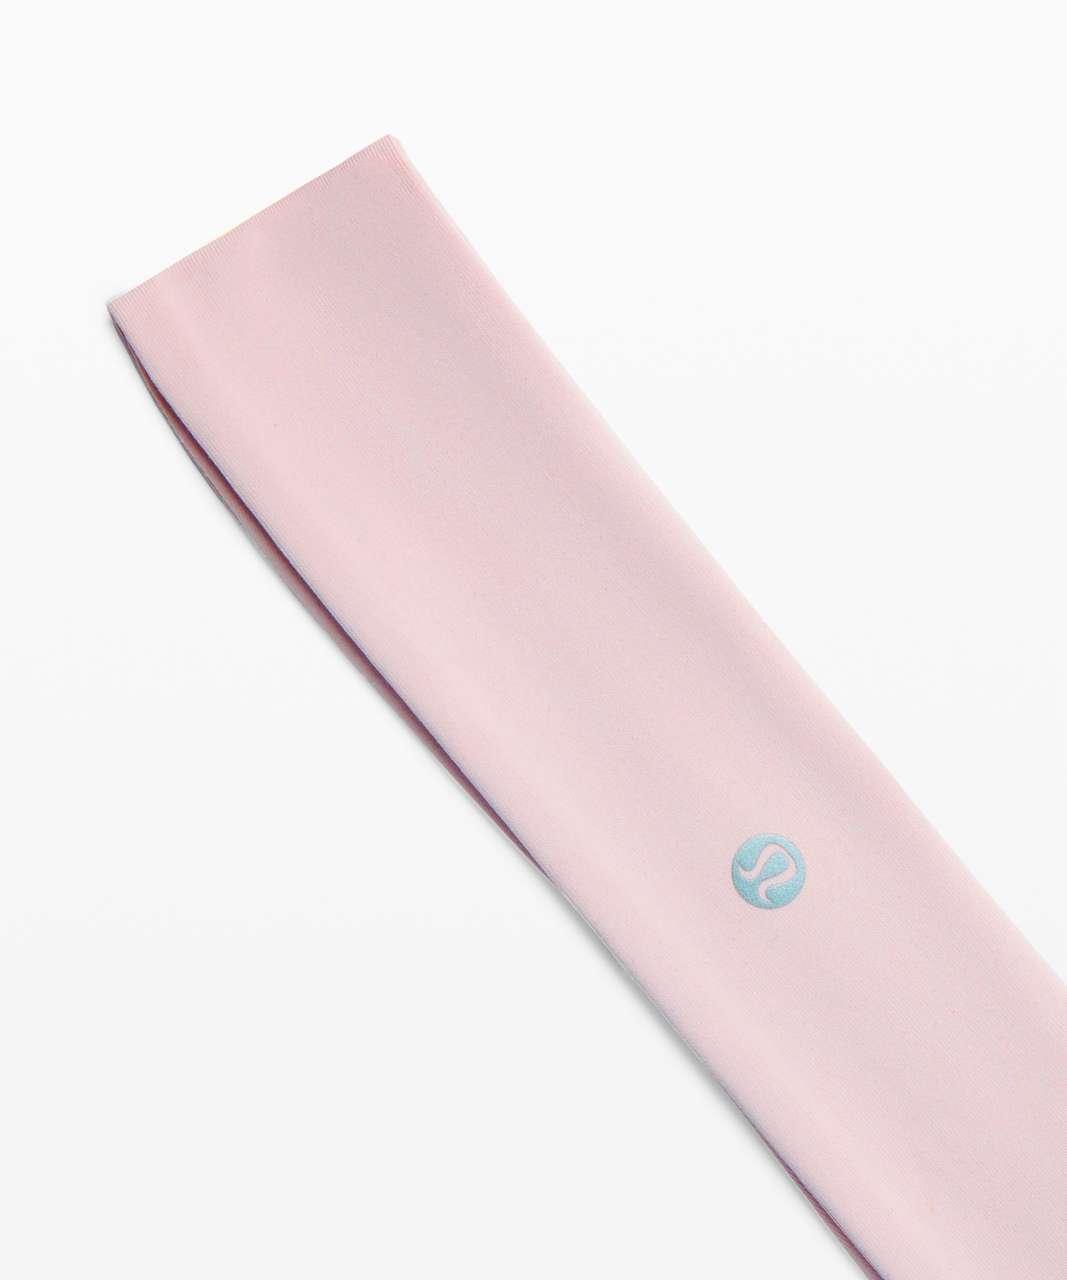 Lululemon Fly Away Tamer Headband - Misty Pink